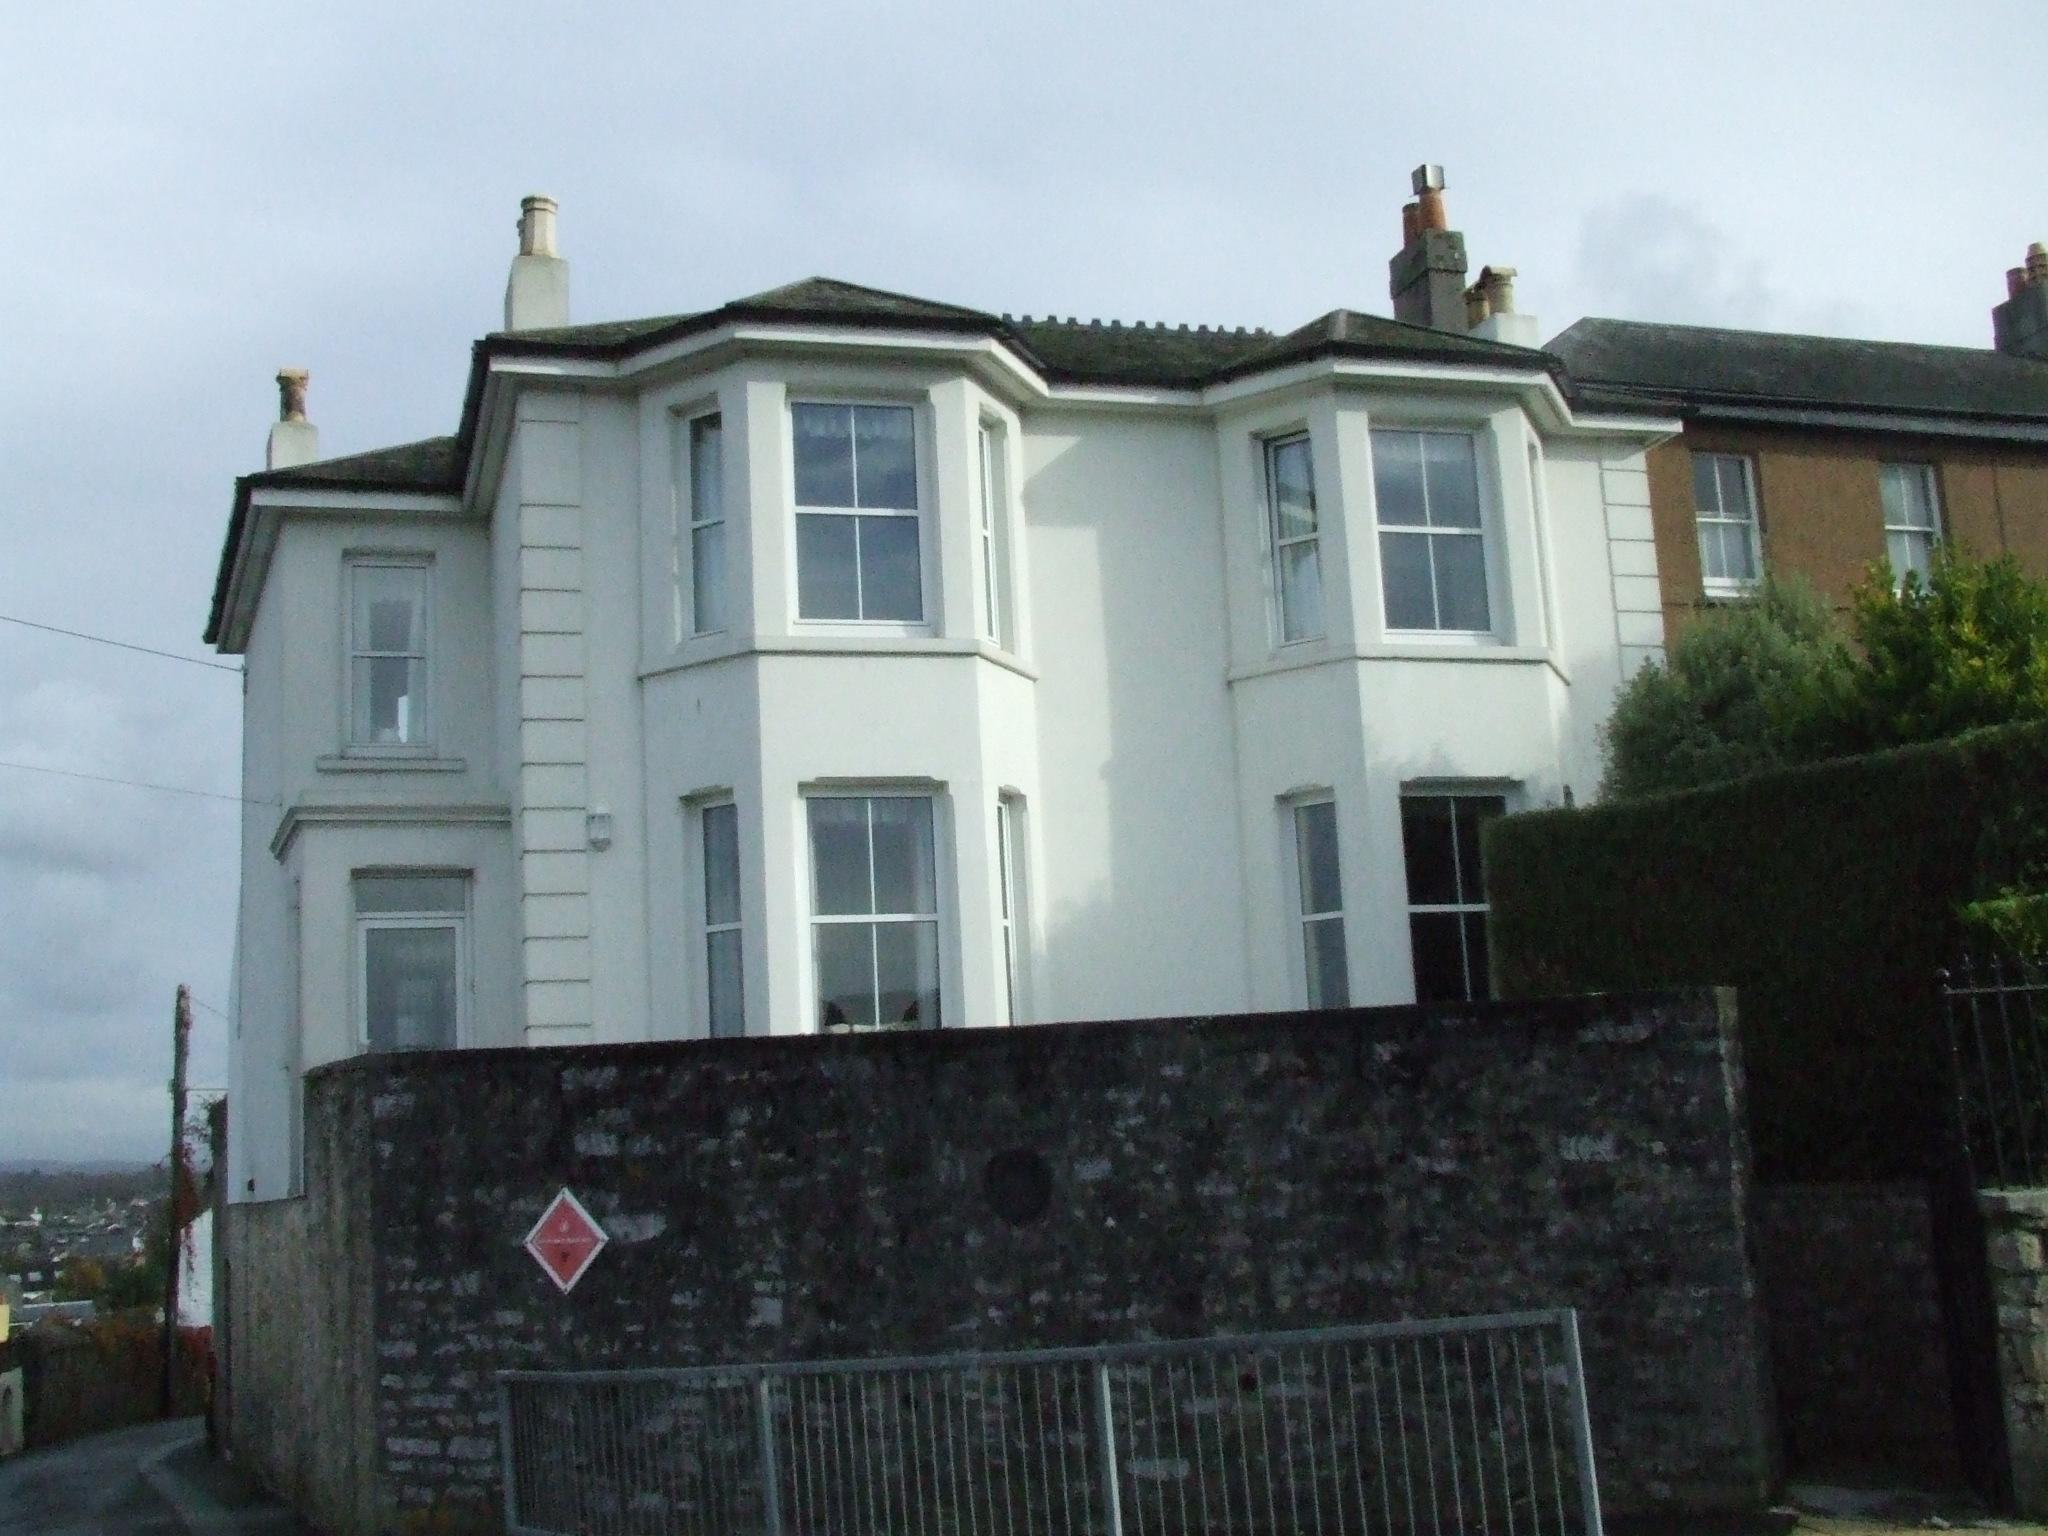 Wall coatings on house mount batten turnchapel plymouth